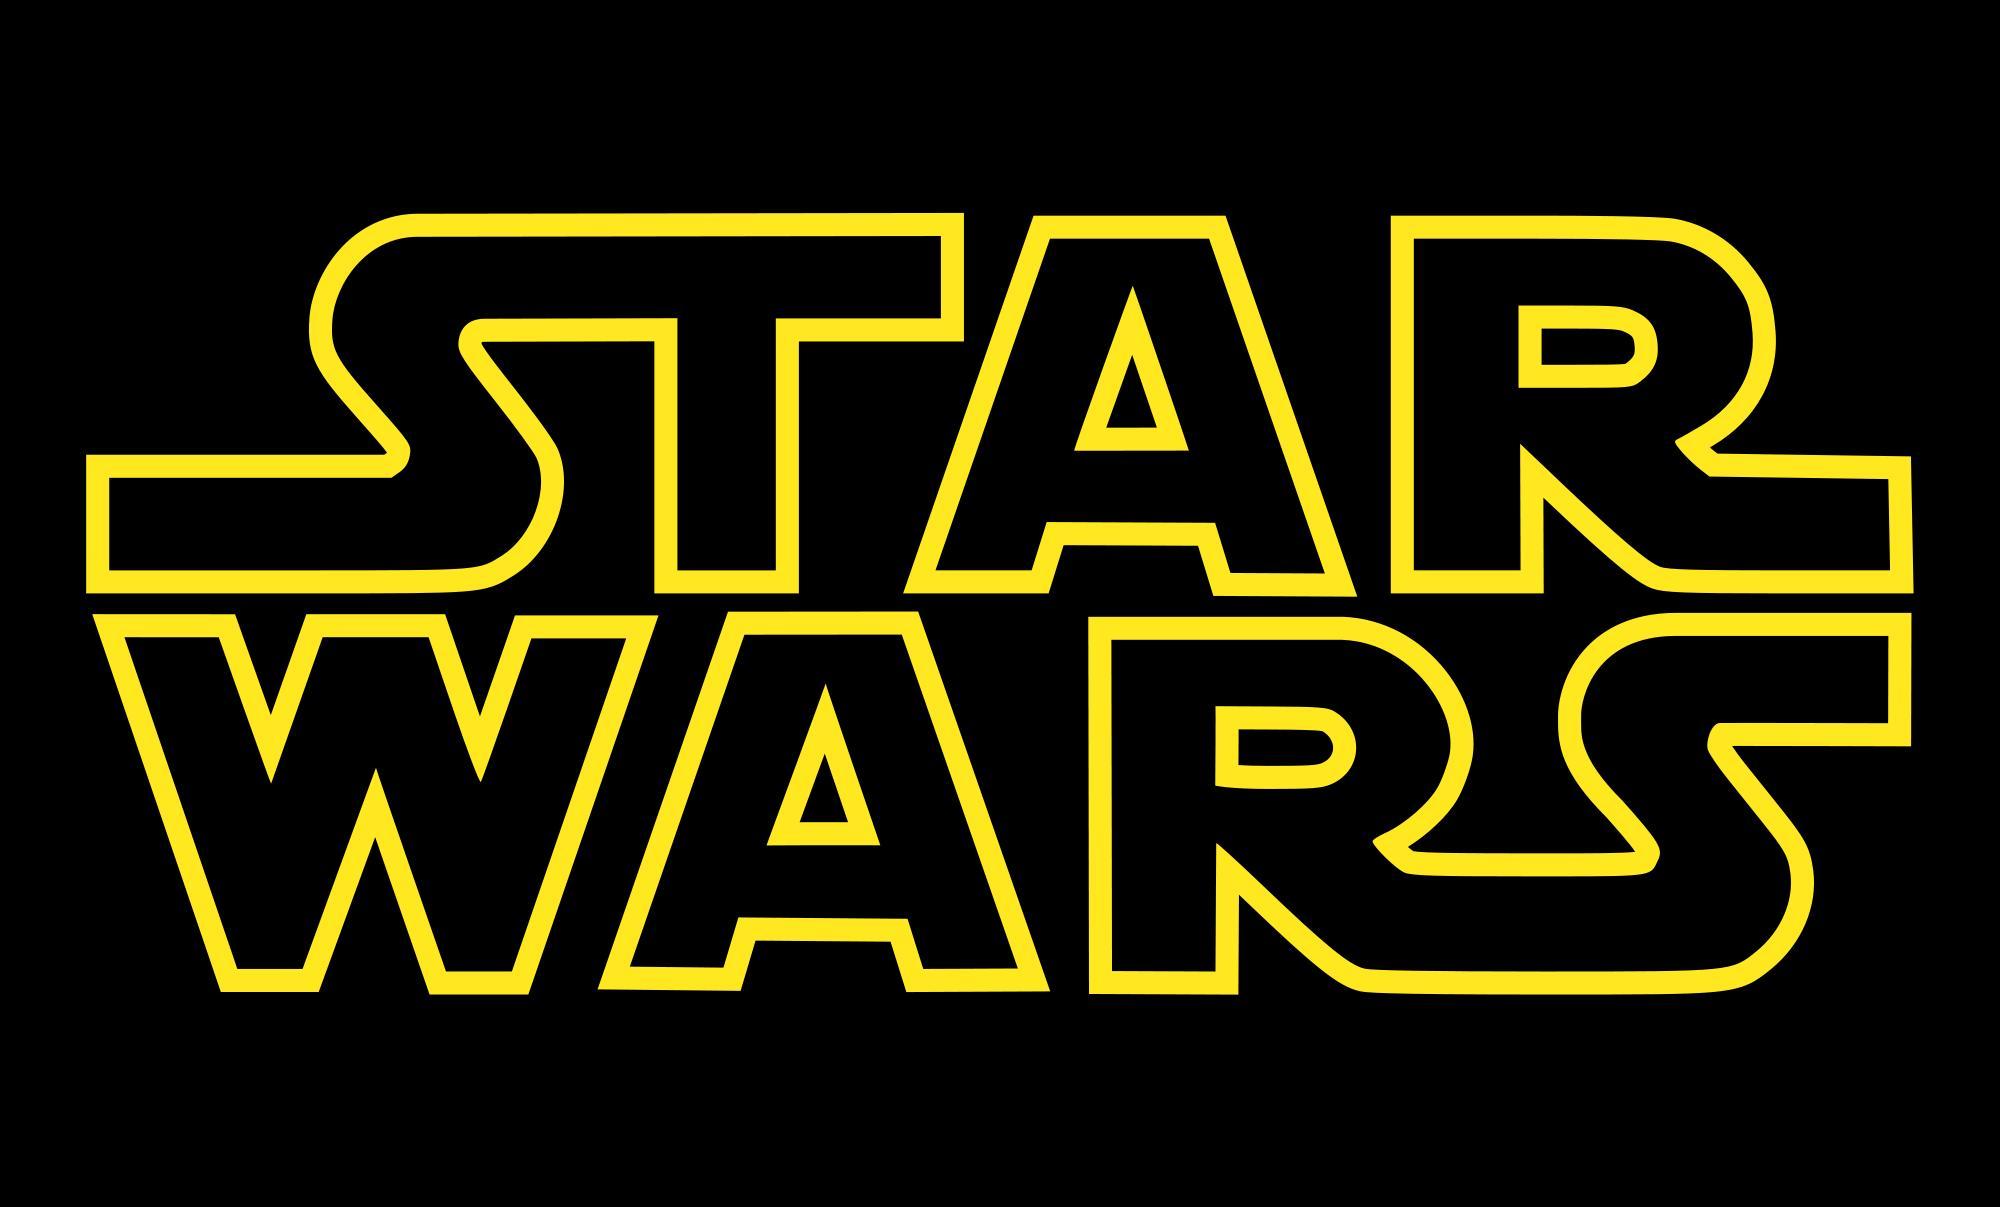 Star Wars III : La Revanche du Quiz